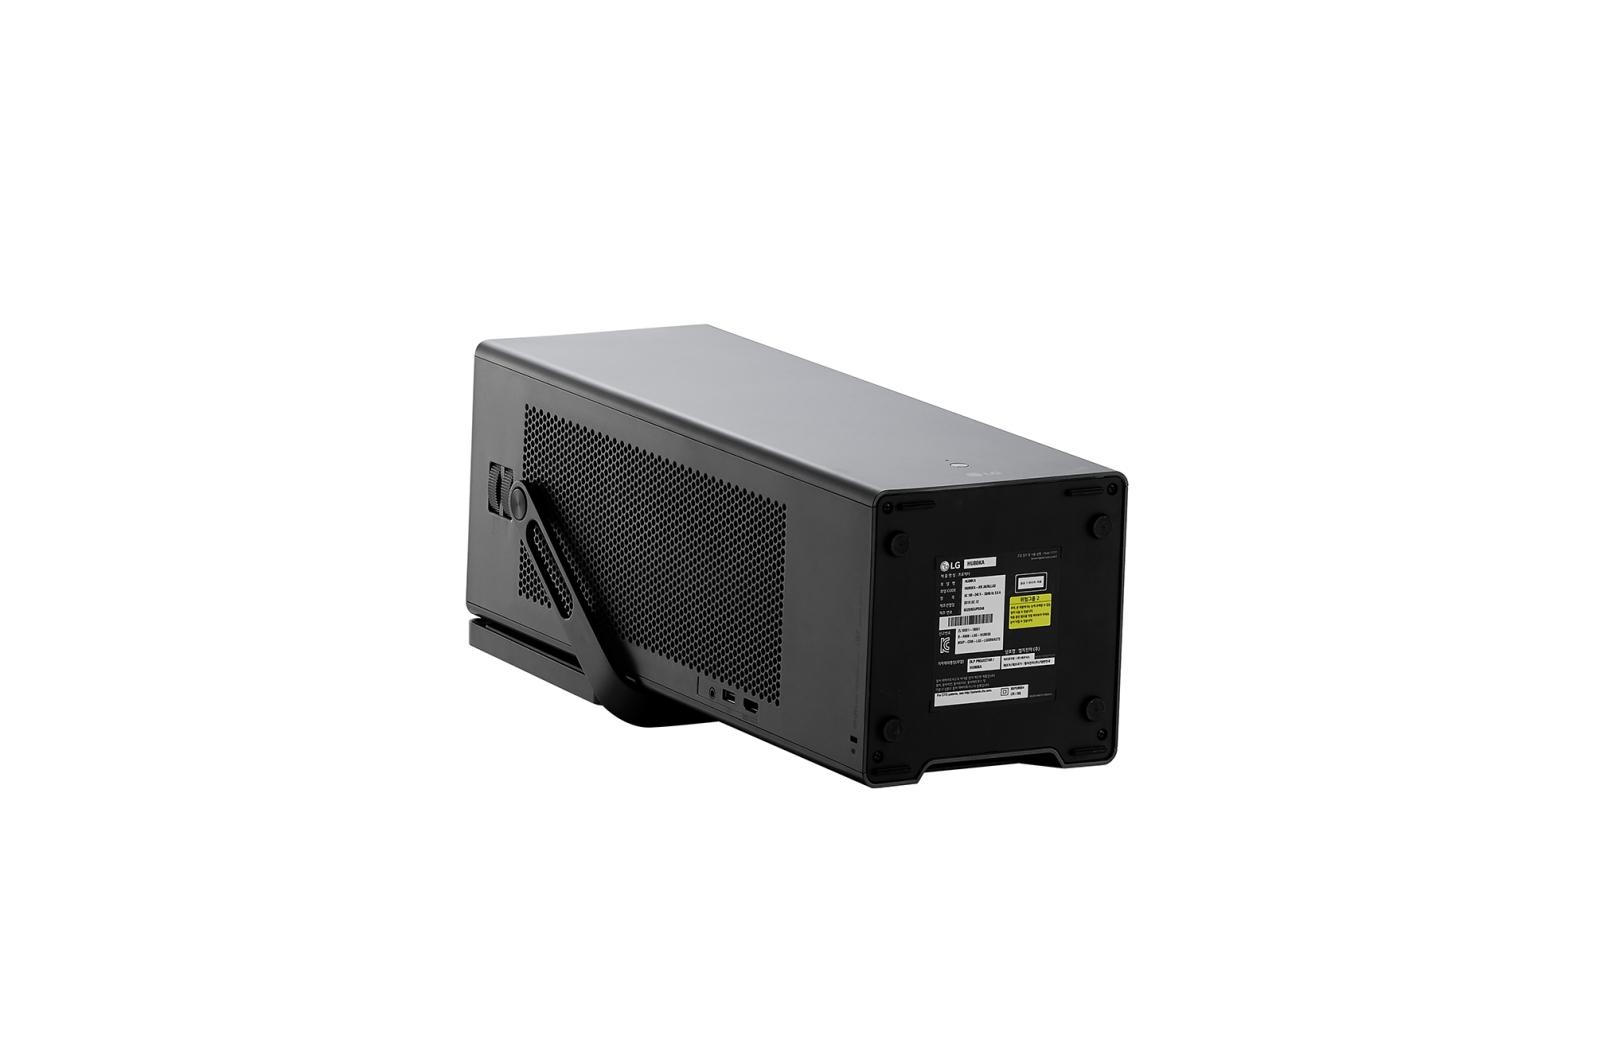 Картинка для Проектор LG HU80KG DLP 2500Lm (3840x2160) 150000:1 ресурс лампы:20000часов 2xUSB typeA 2xHDMI 6.7кг